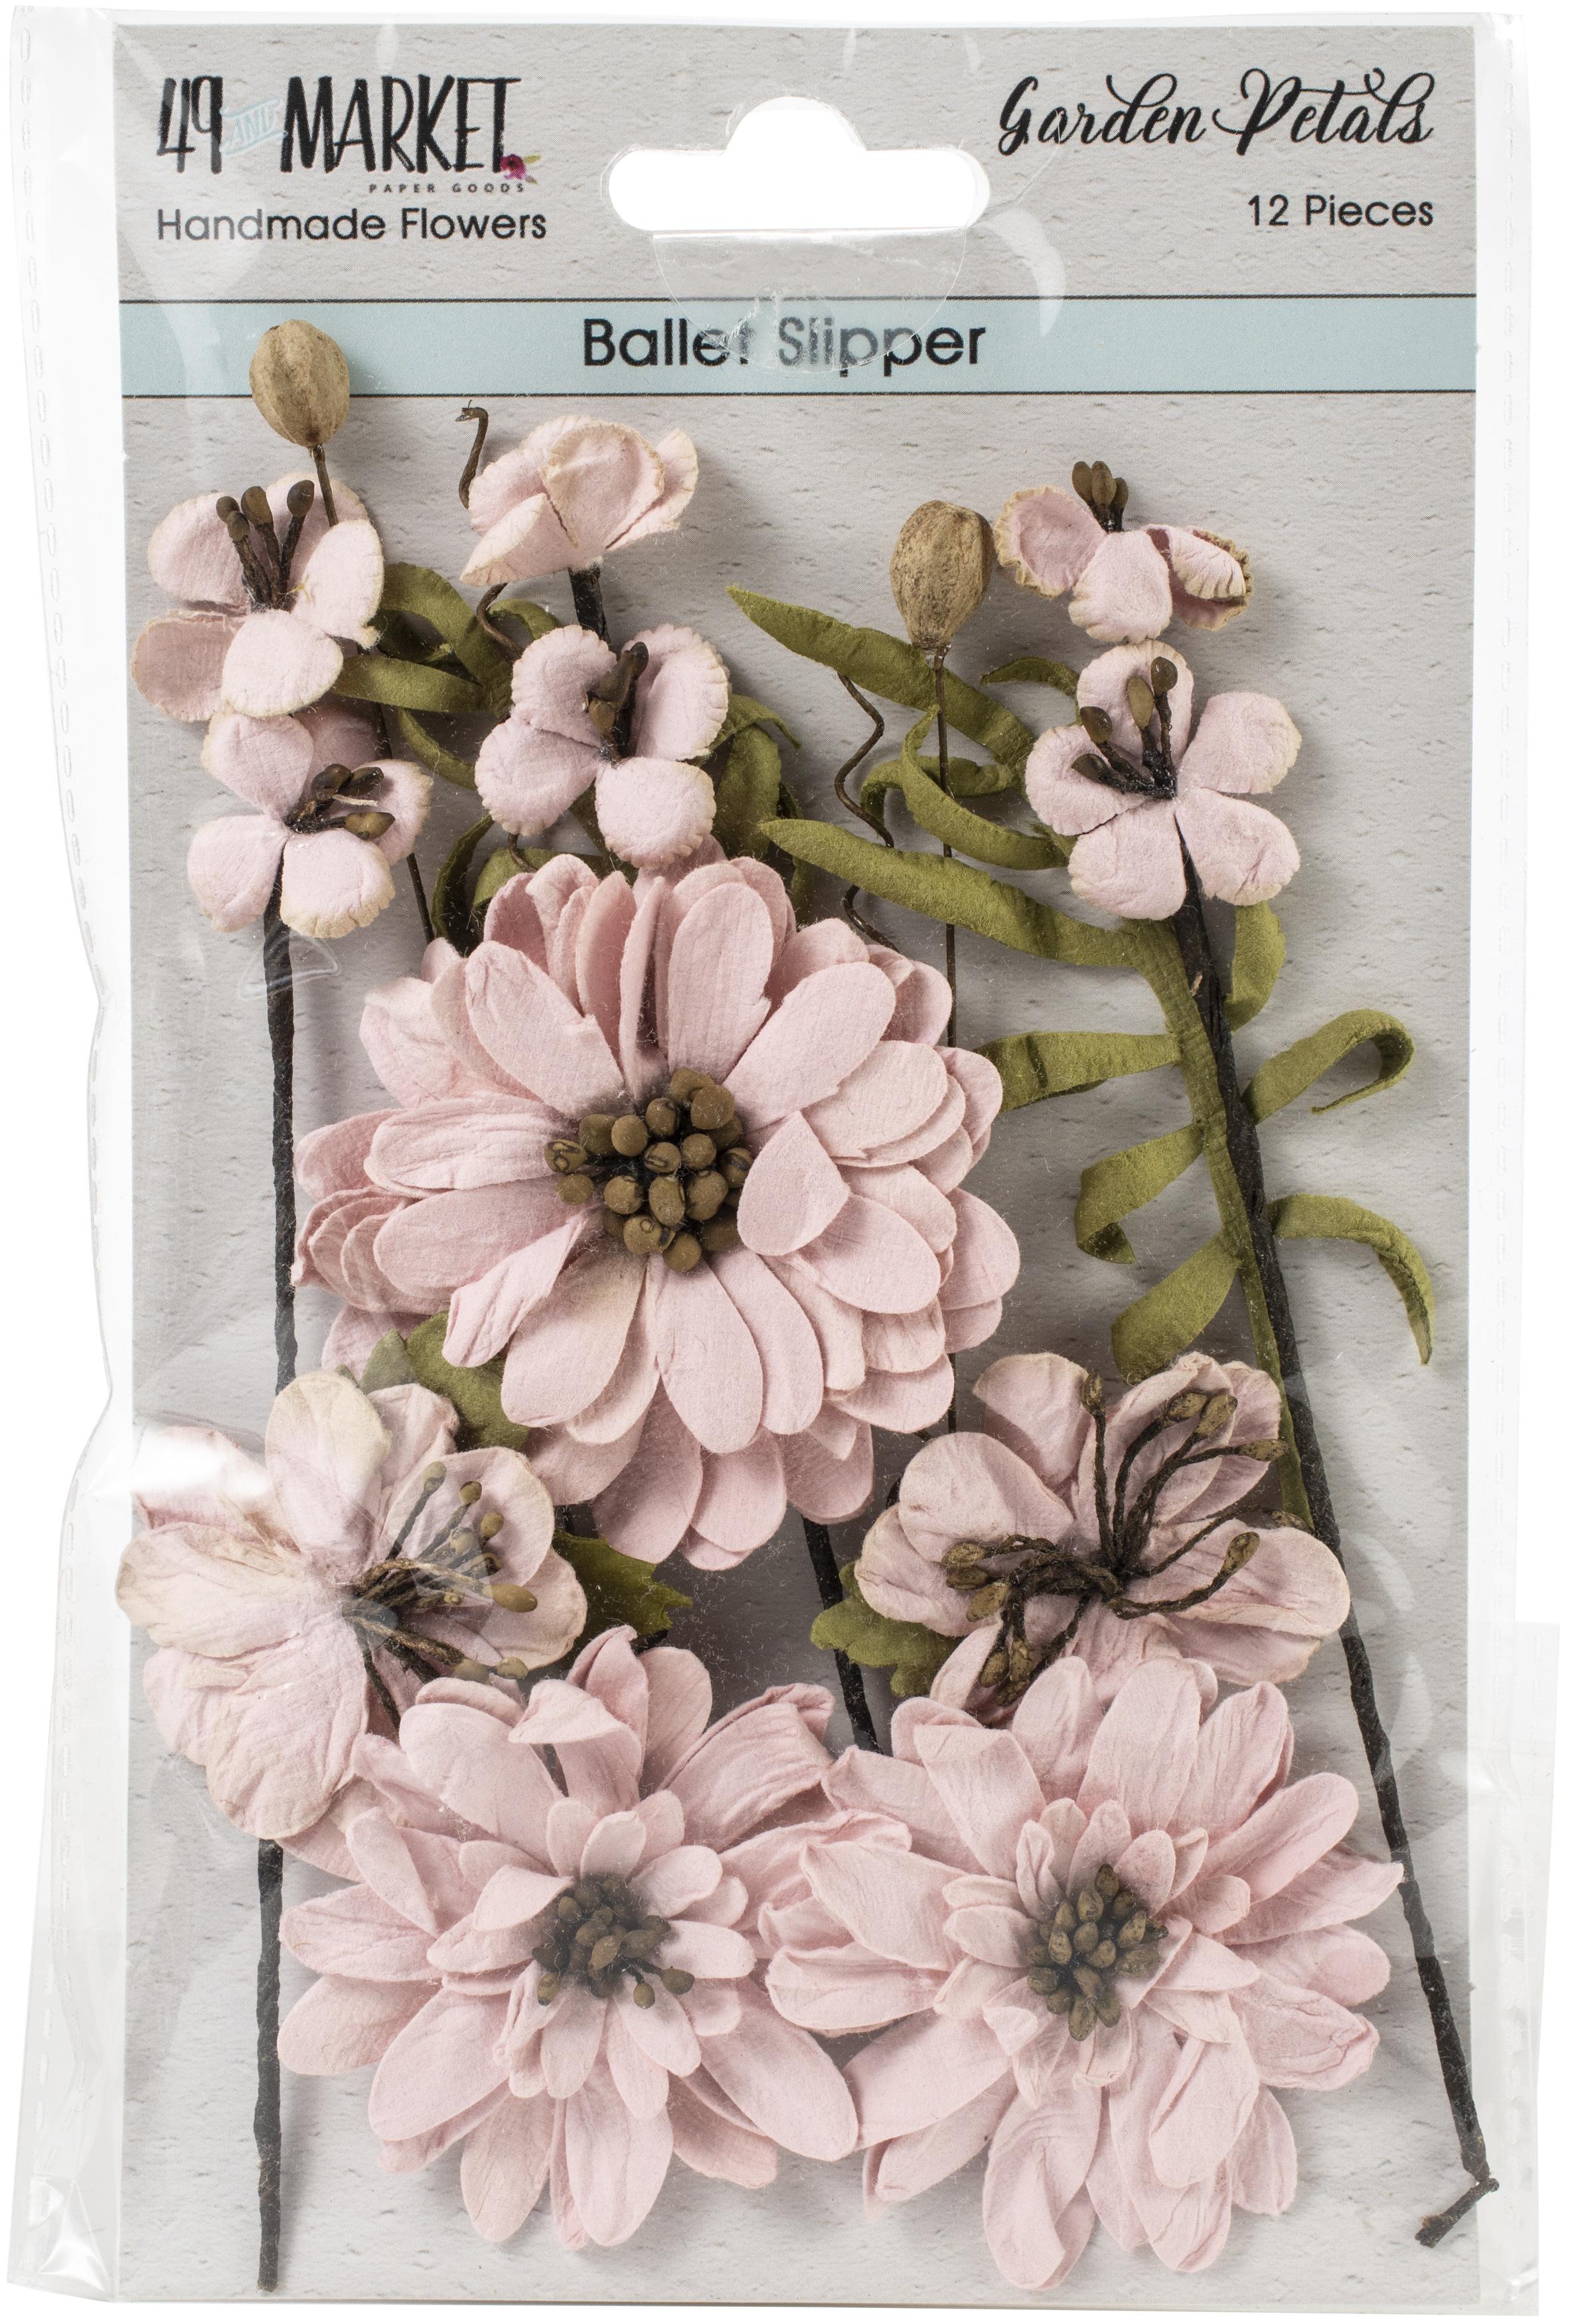 49 & Market garden petals ballet slipper